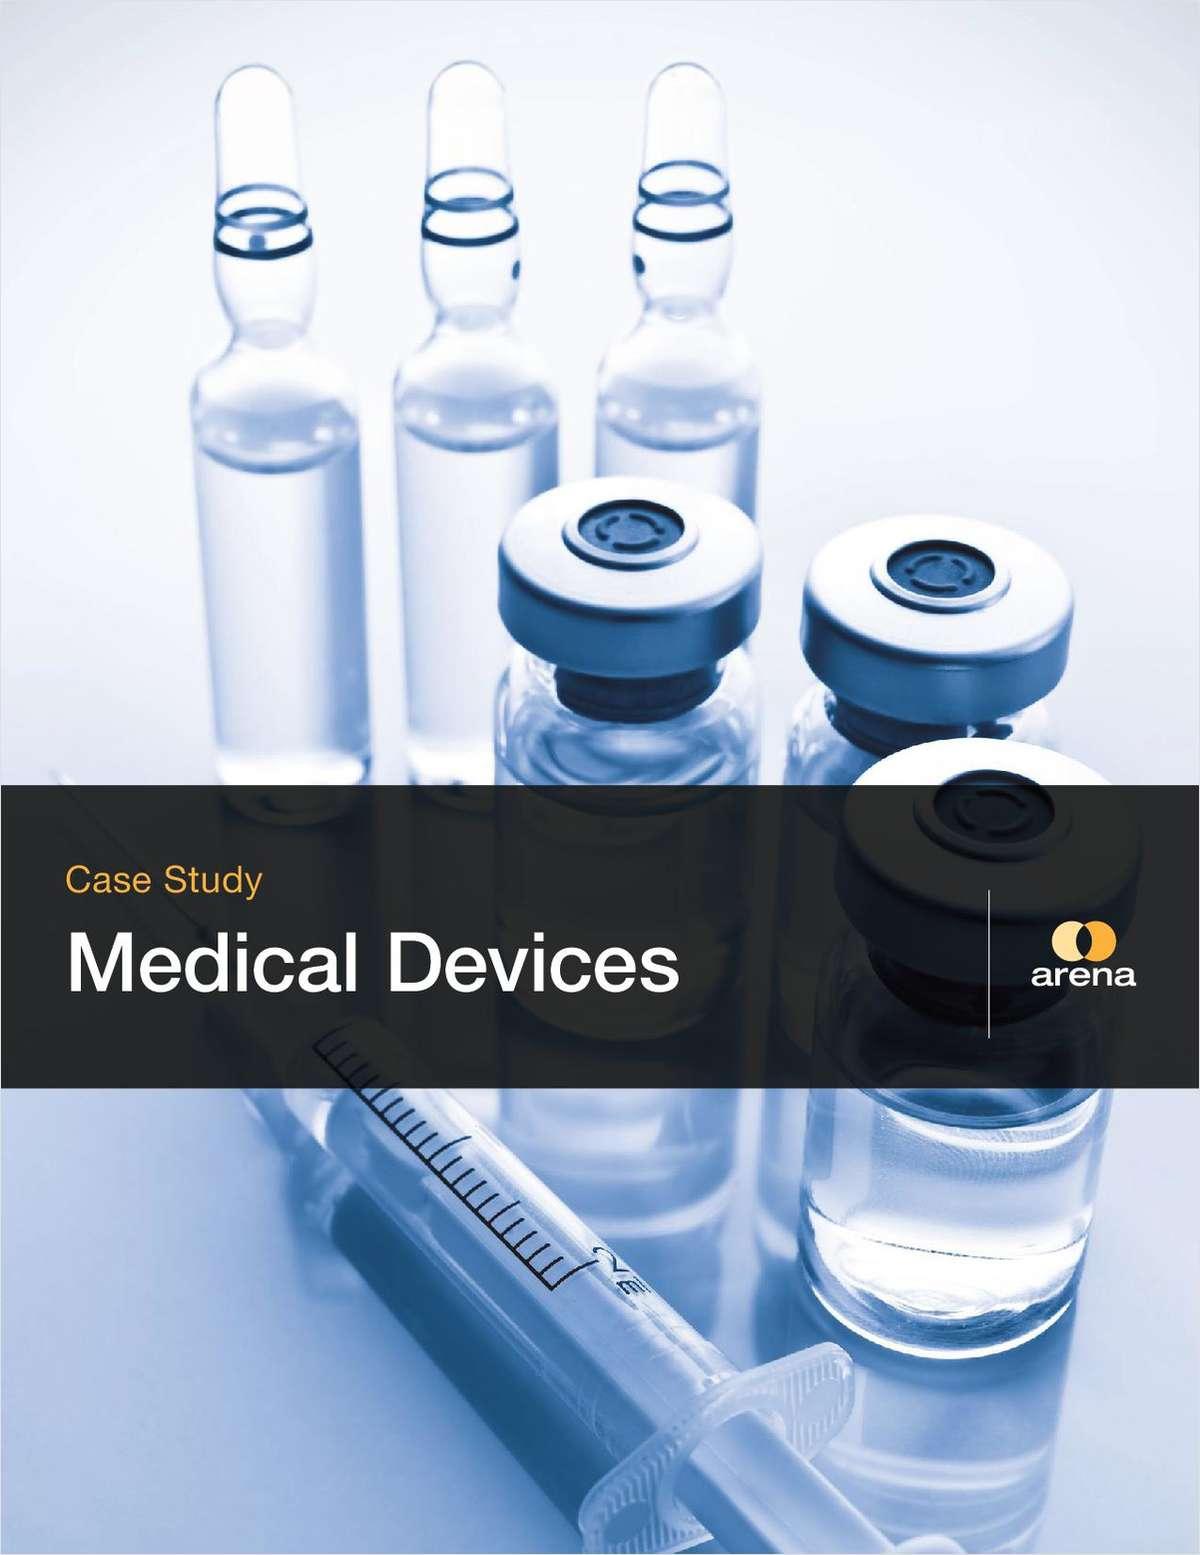 Yukon Medical Case Study